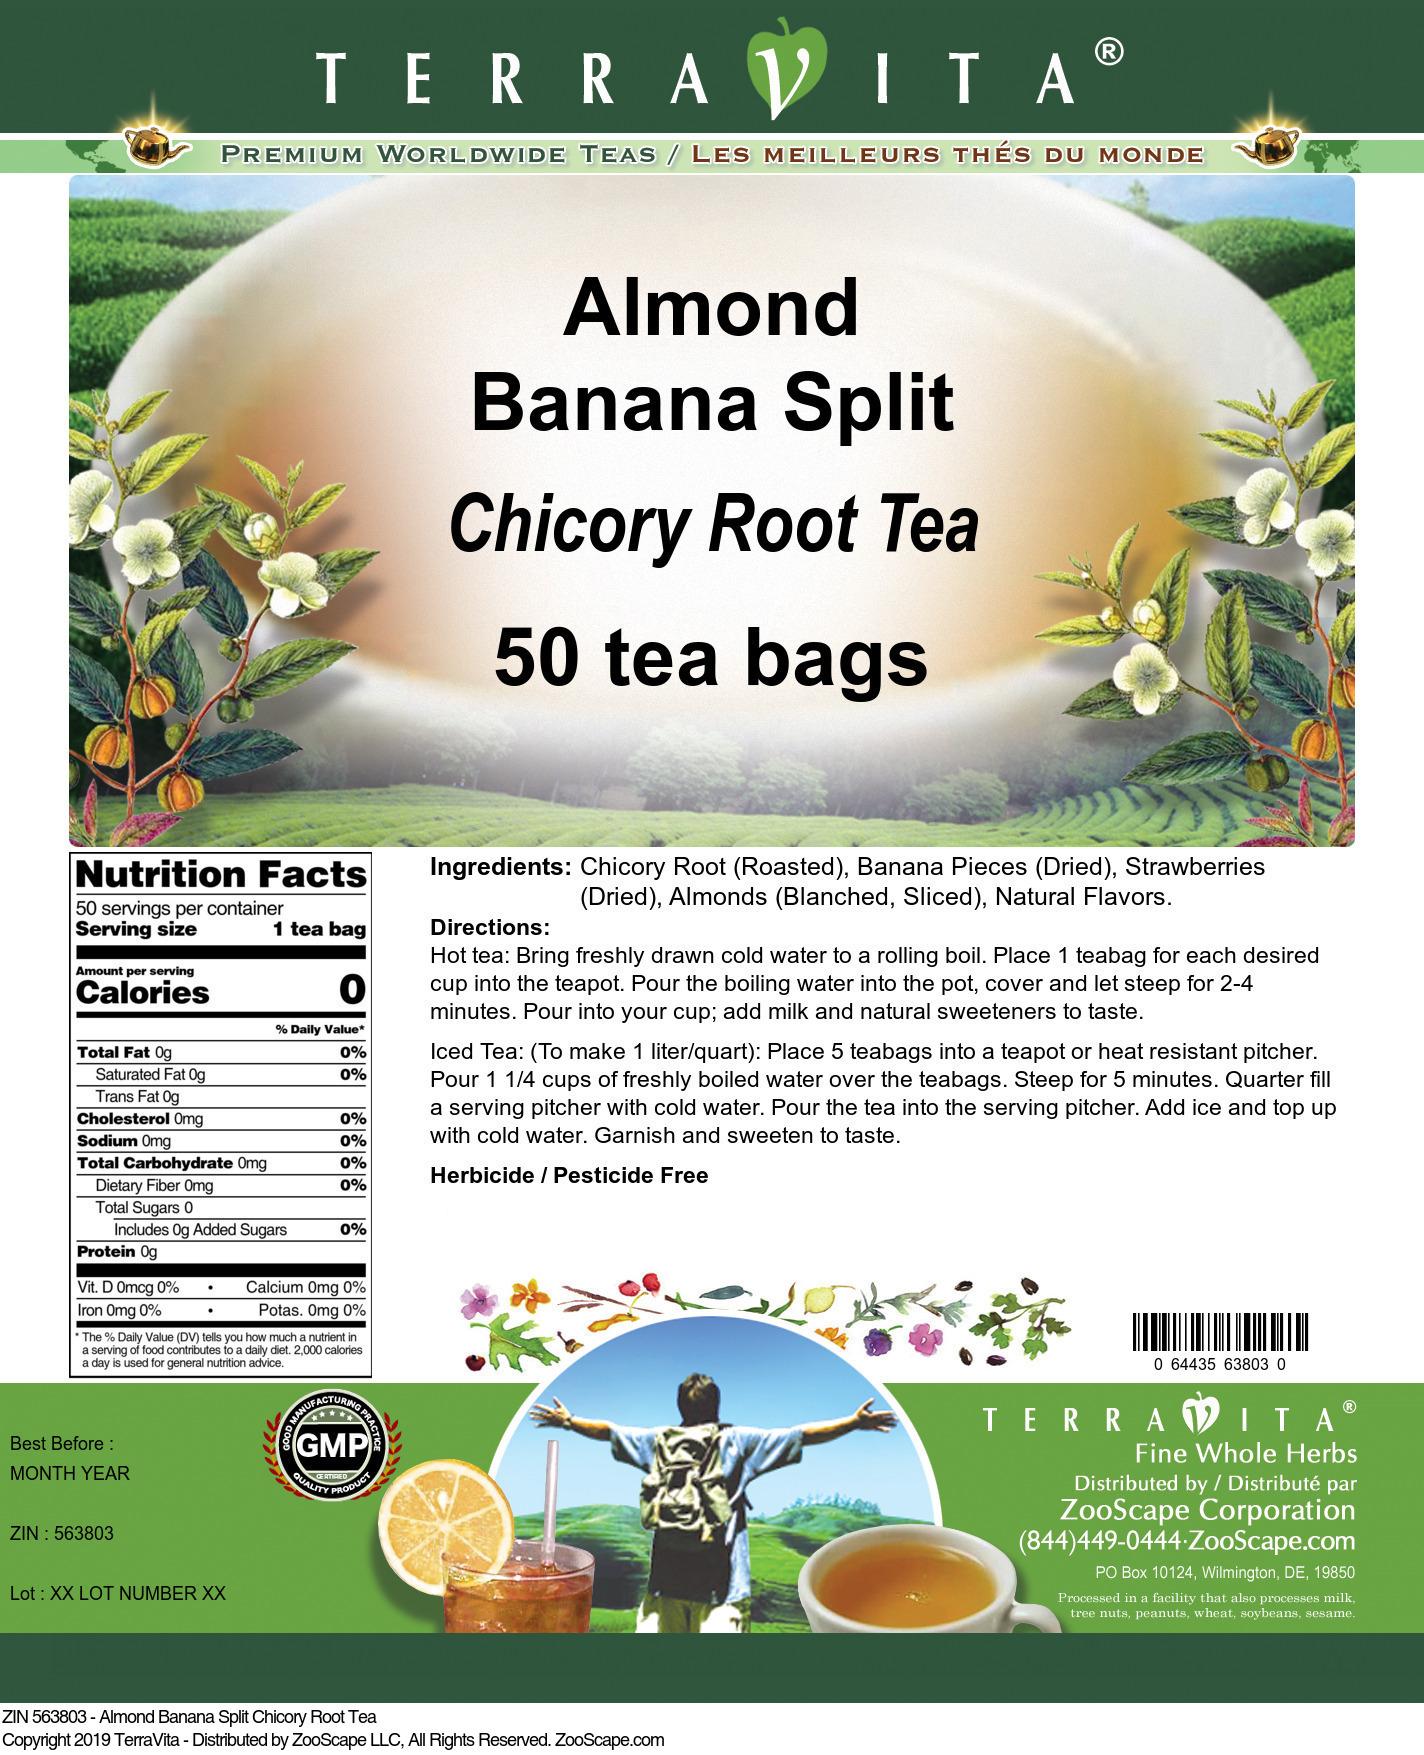 Almond Banana Split Chicory Root